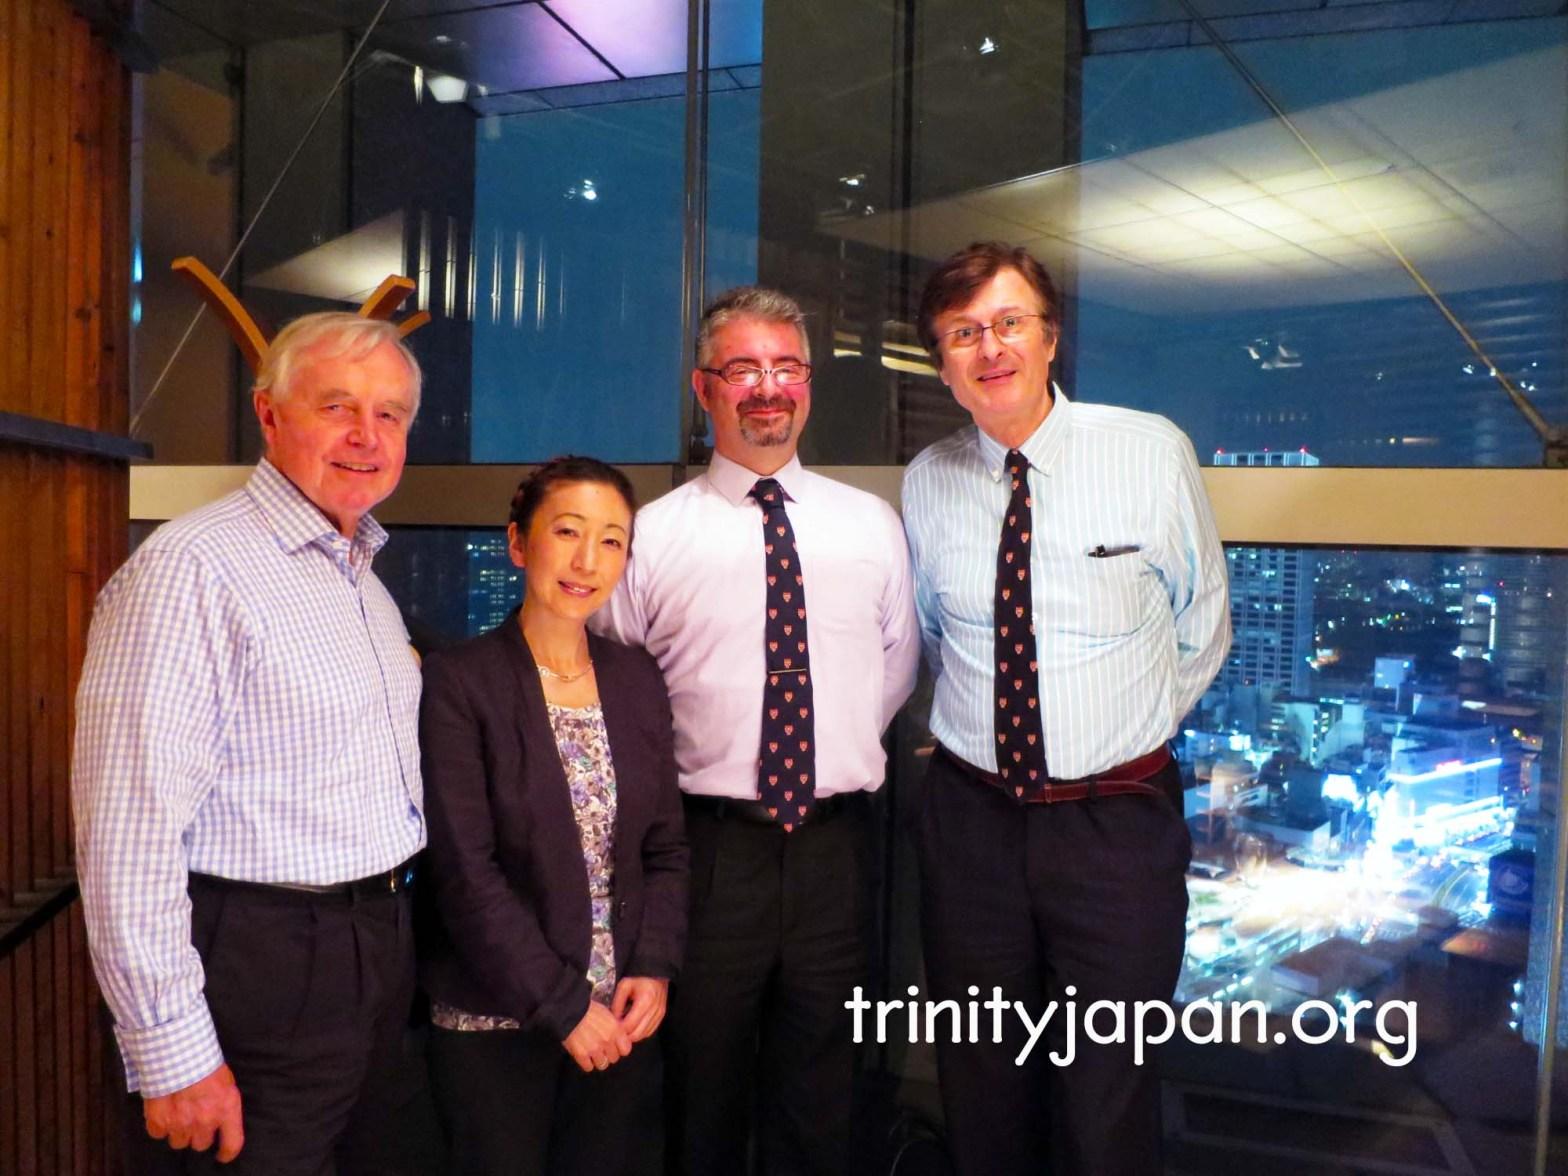 3rd Trinity in Japan Society meeting on Thursday, 24 September 2015